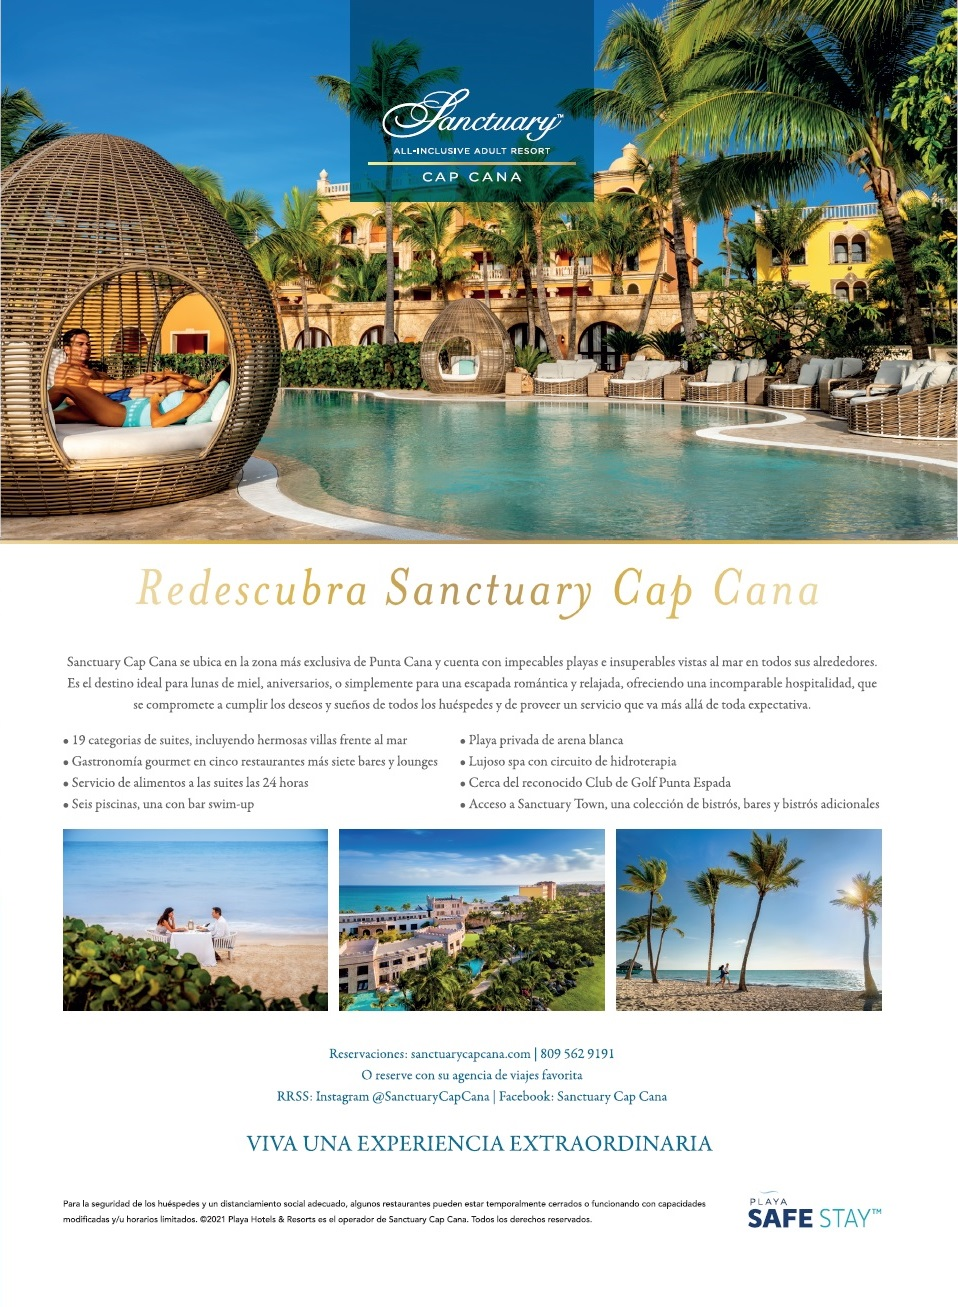 Sanctuary Cap Cana by Playa - Hotels & Resorts